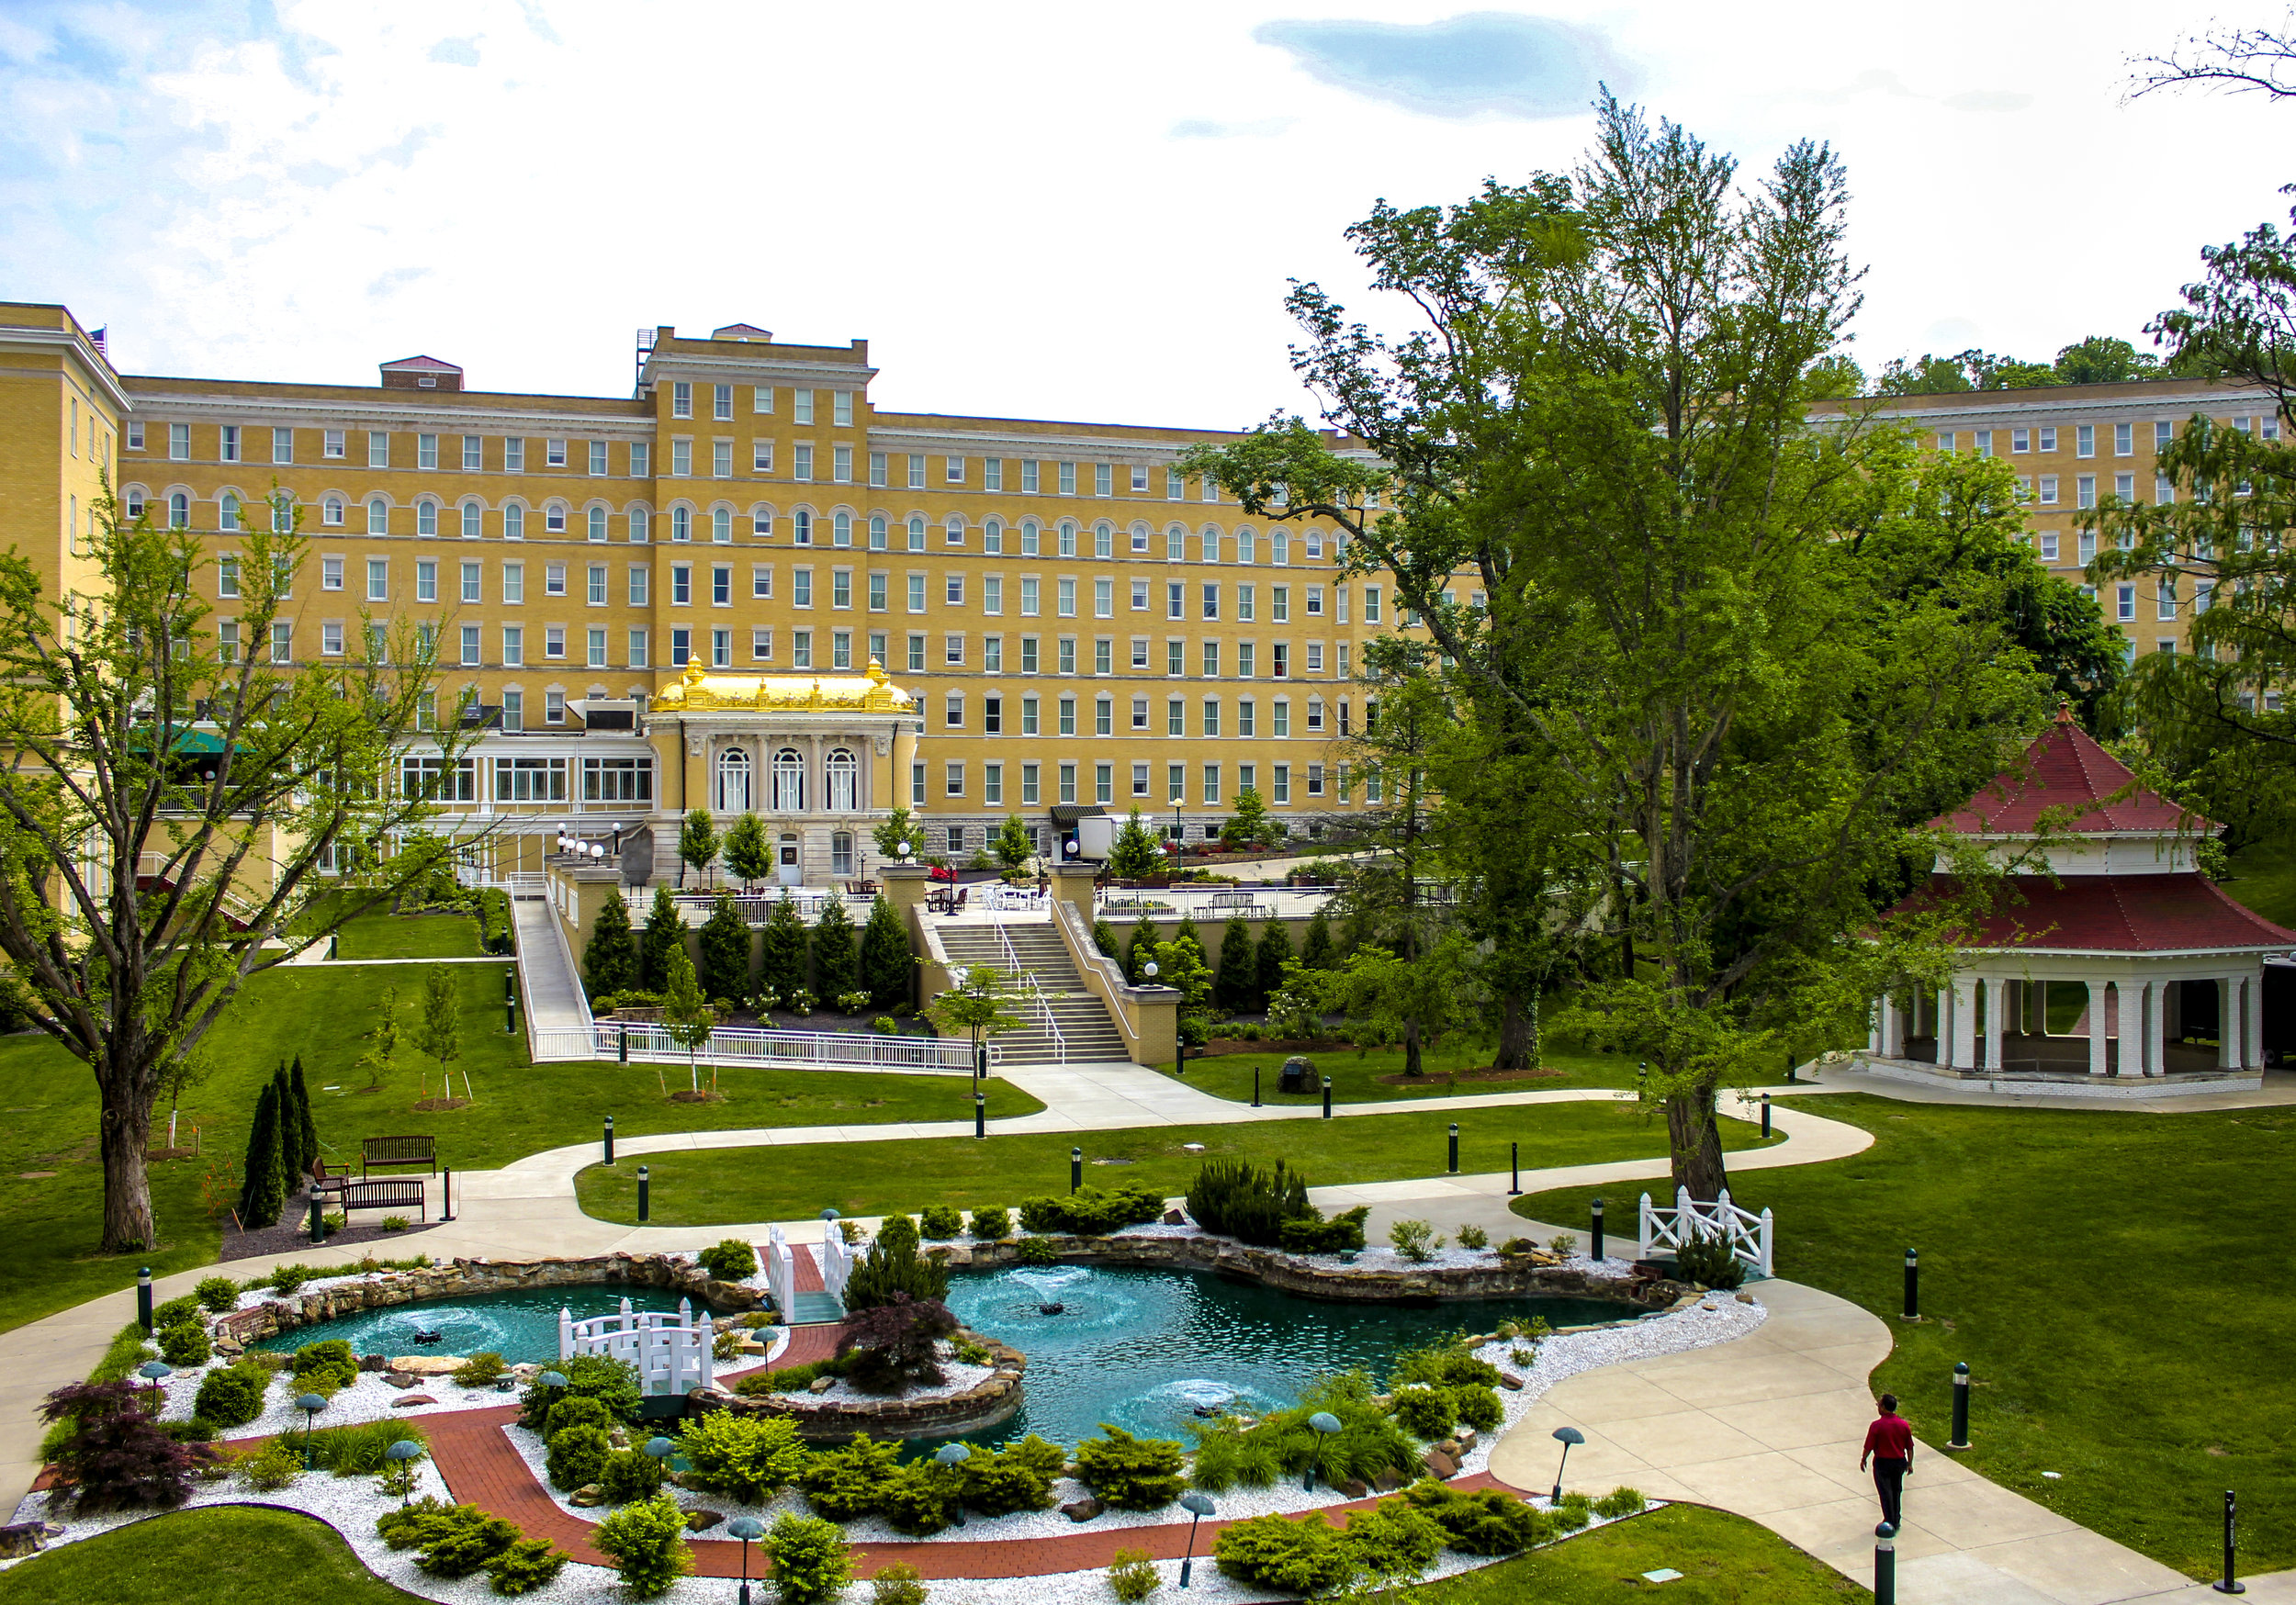 French Lick Springs Hotel Garden.jpg